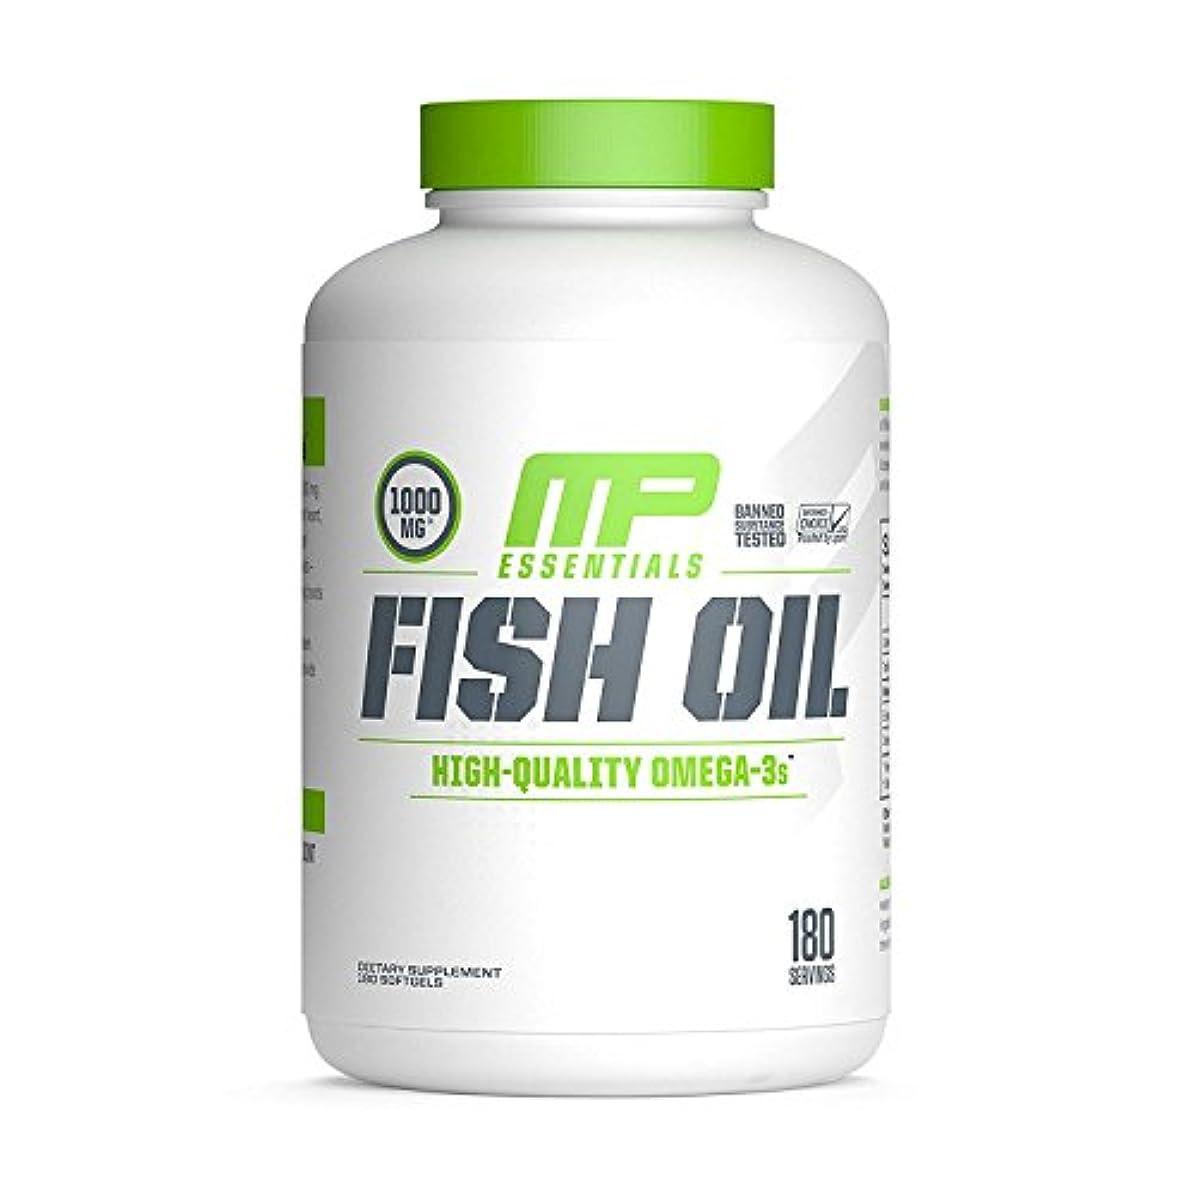 塗抹側面典型的な海外直送品 MusclePharm, Fish Oil Essentials 180 Servings [並行輸入品]